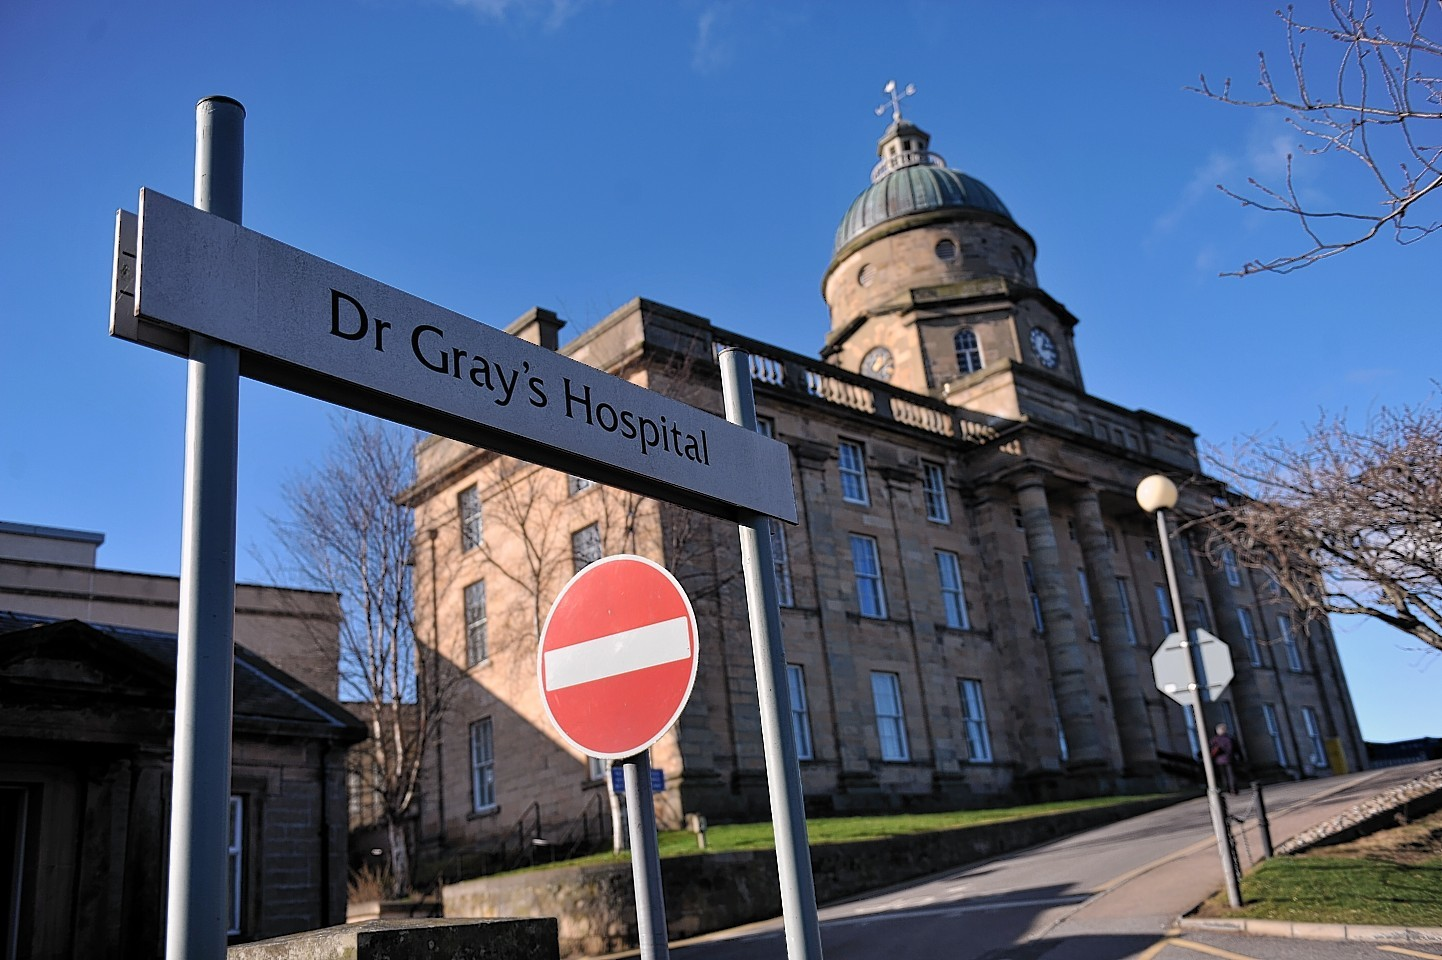 Dr Gray''s Hospital in Elgin